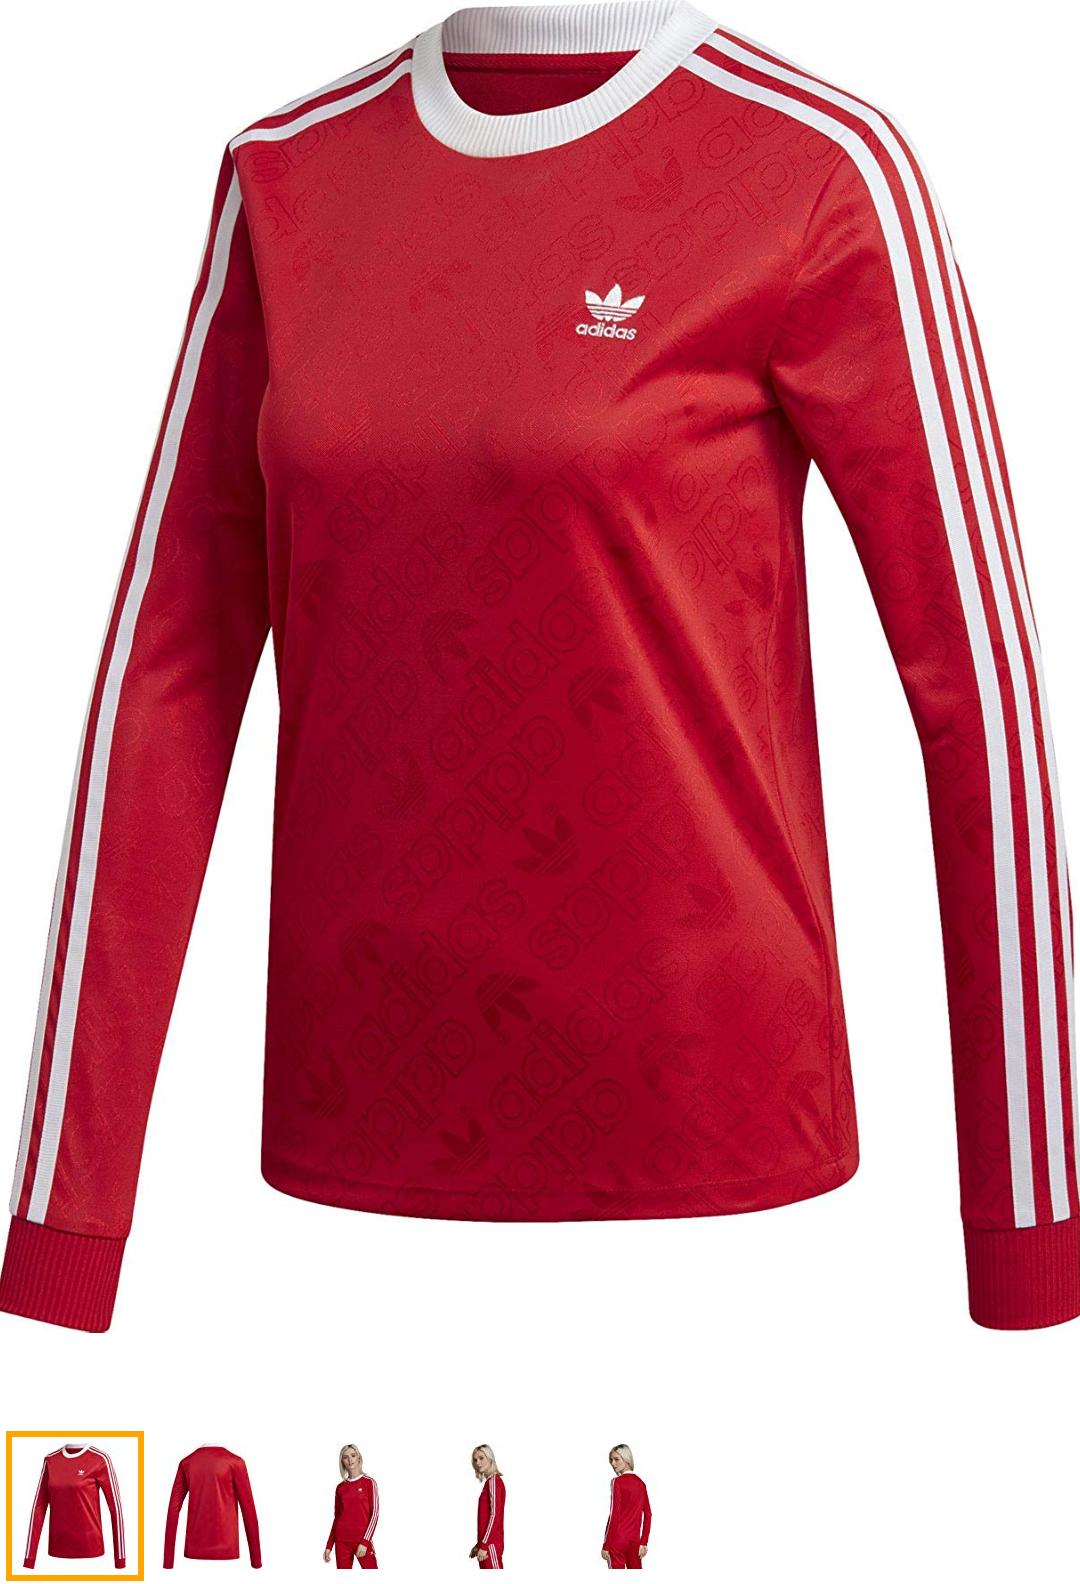 Camiseta roja Adidas Mujer talla 42